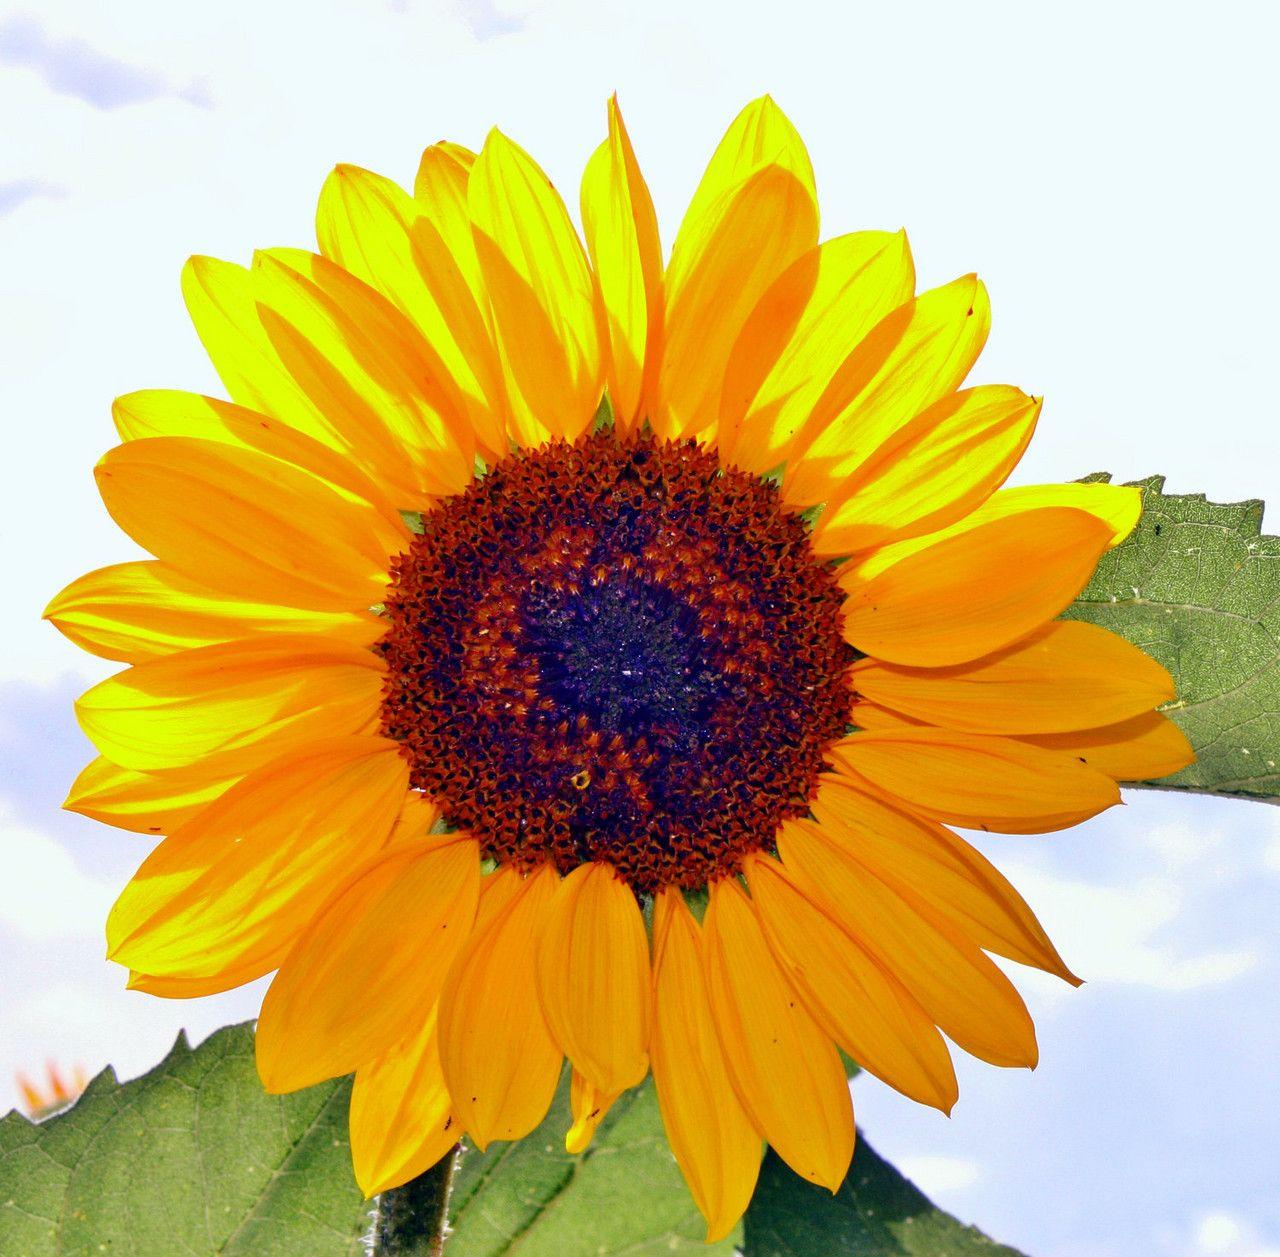 Yellow sunflower photo x print unique wall art shabby chic